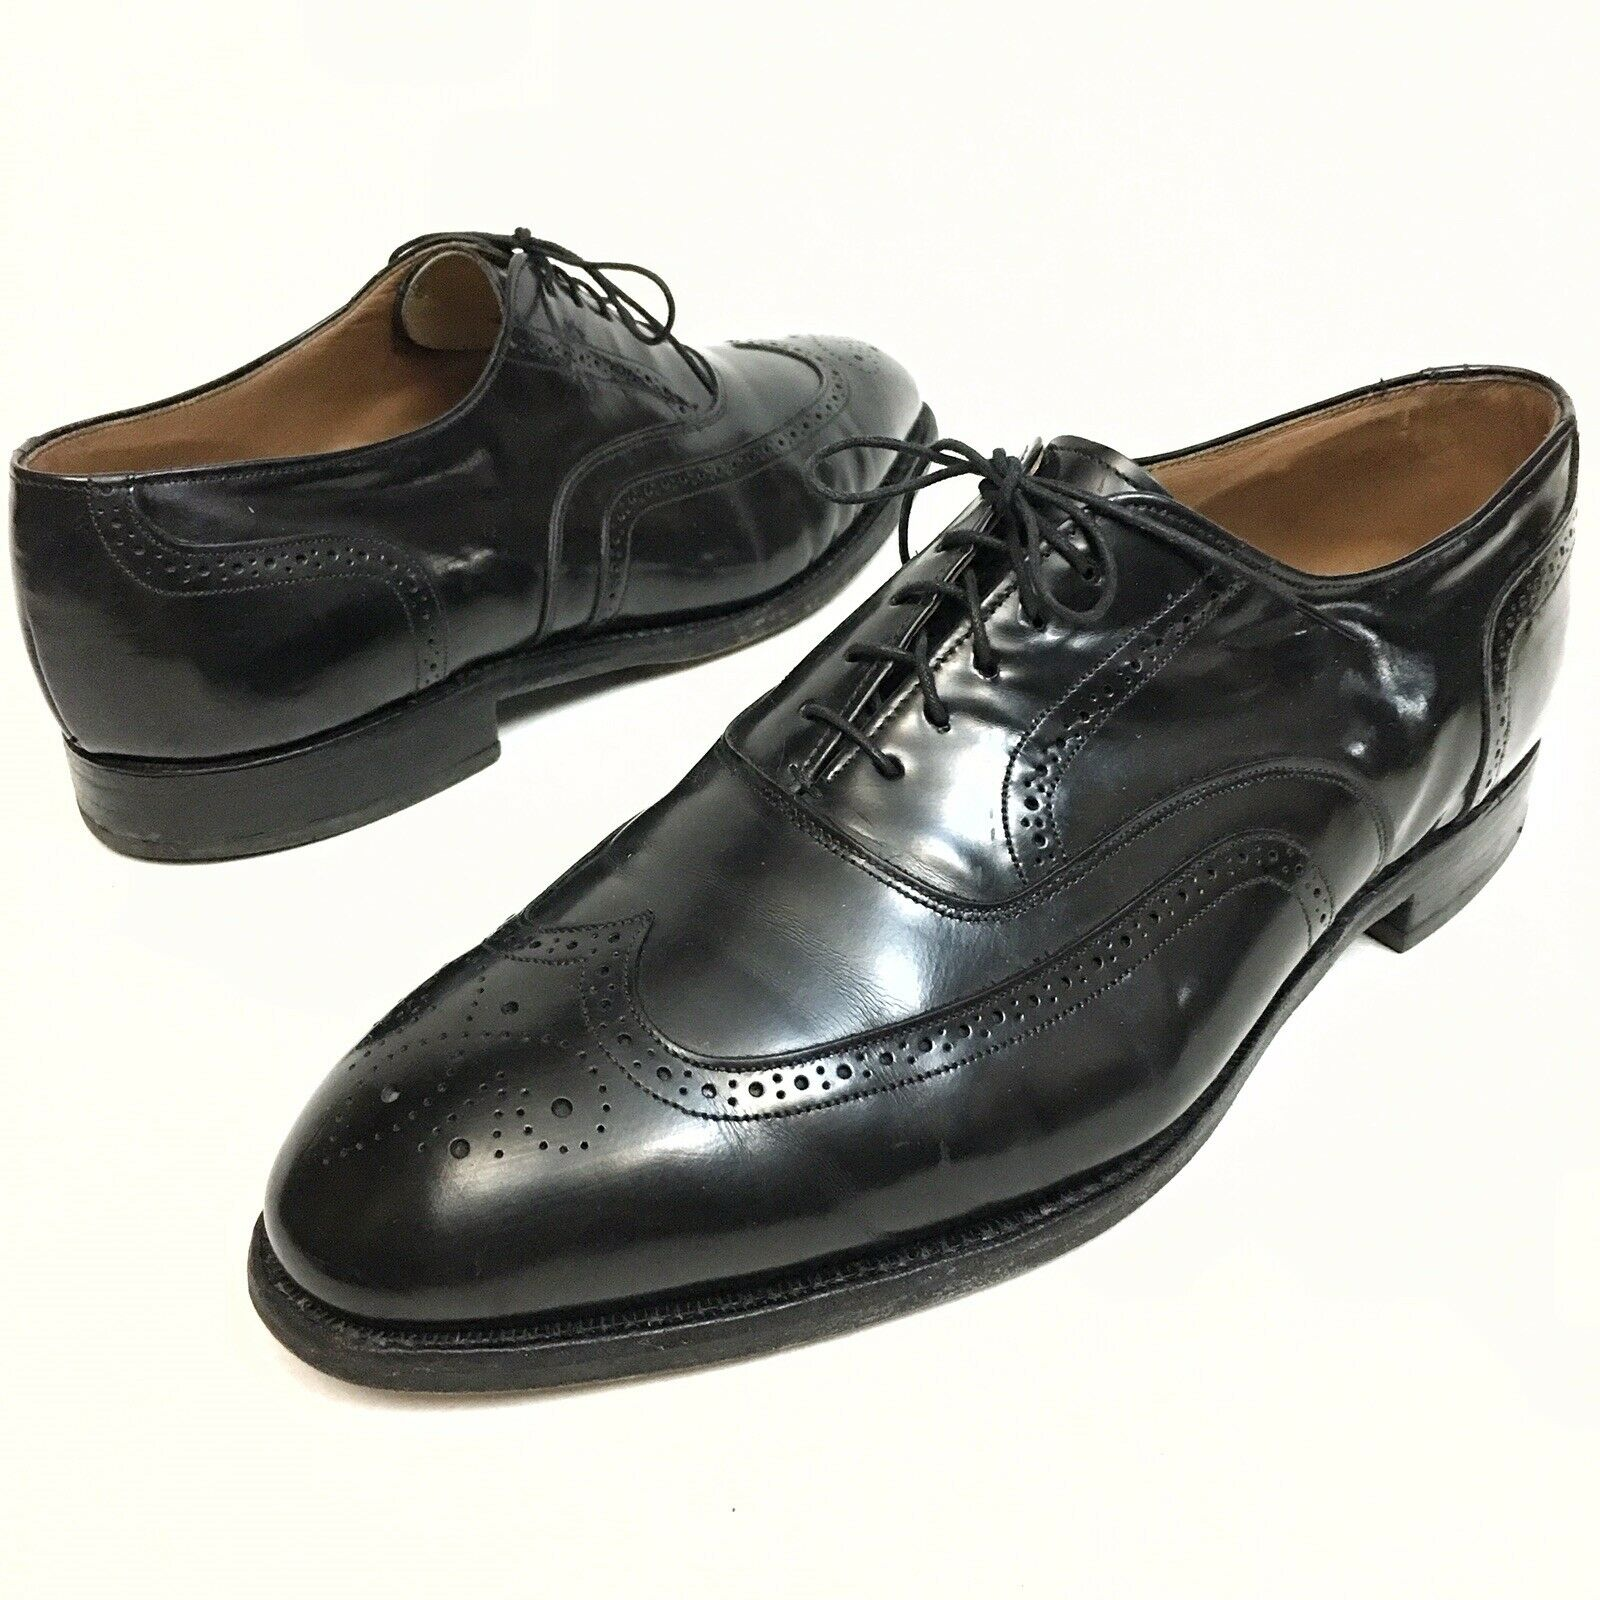 ✅💟✅ Johnston & Murphy Optima Men' Shoes Size 11 E Black Oxford Wingtips Dress